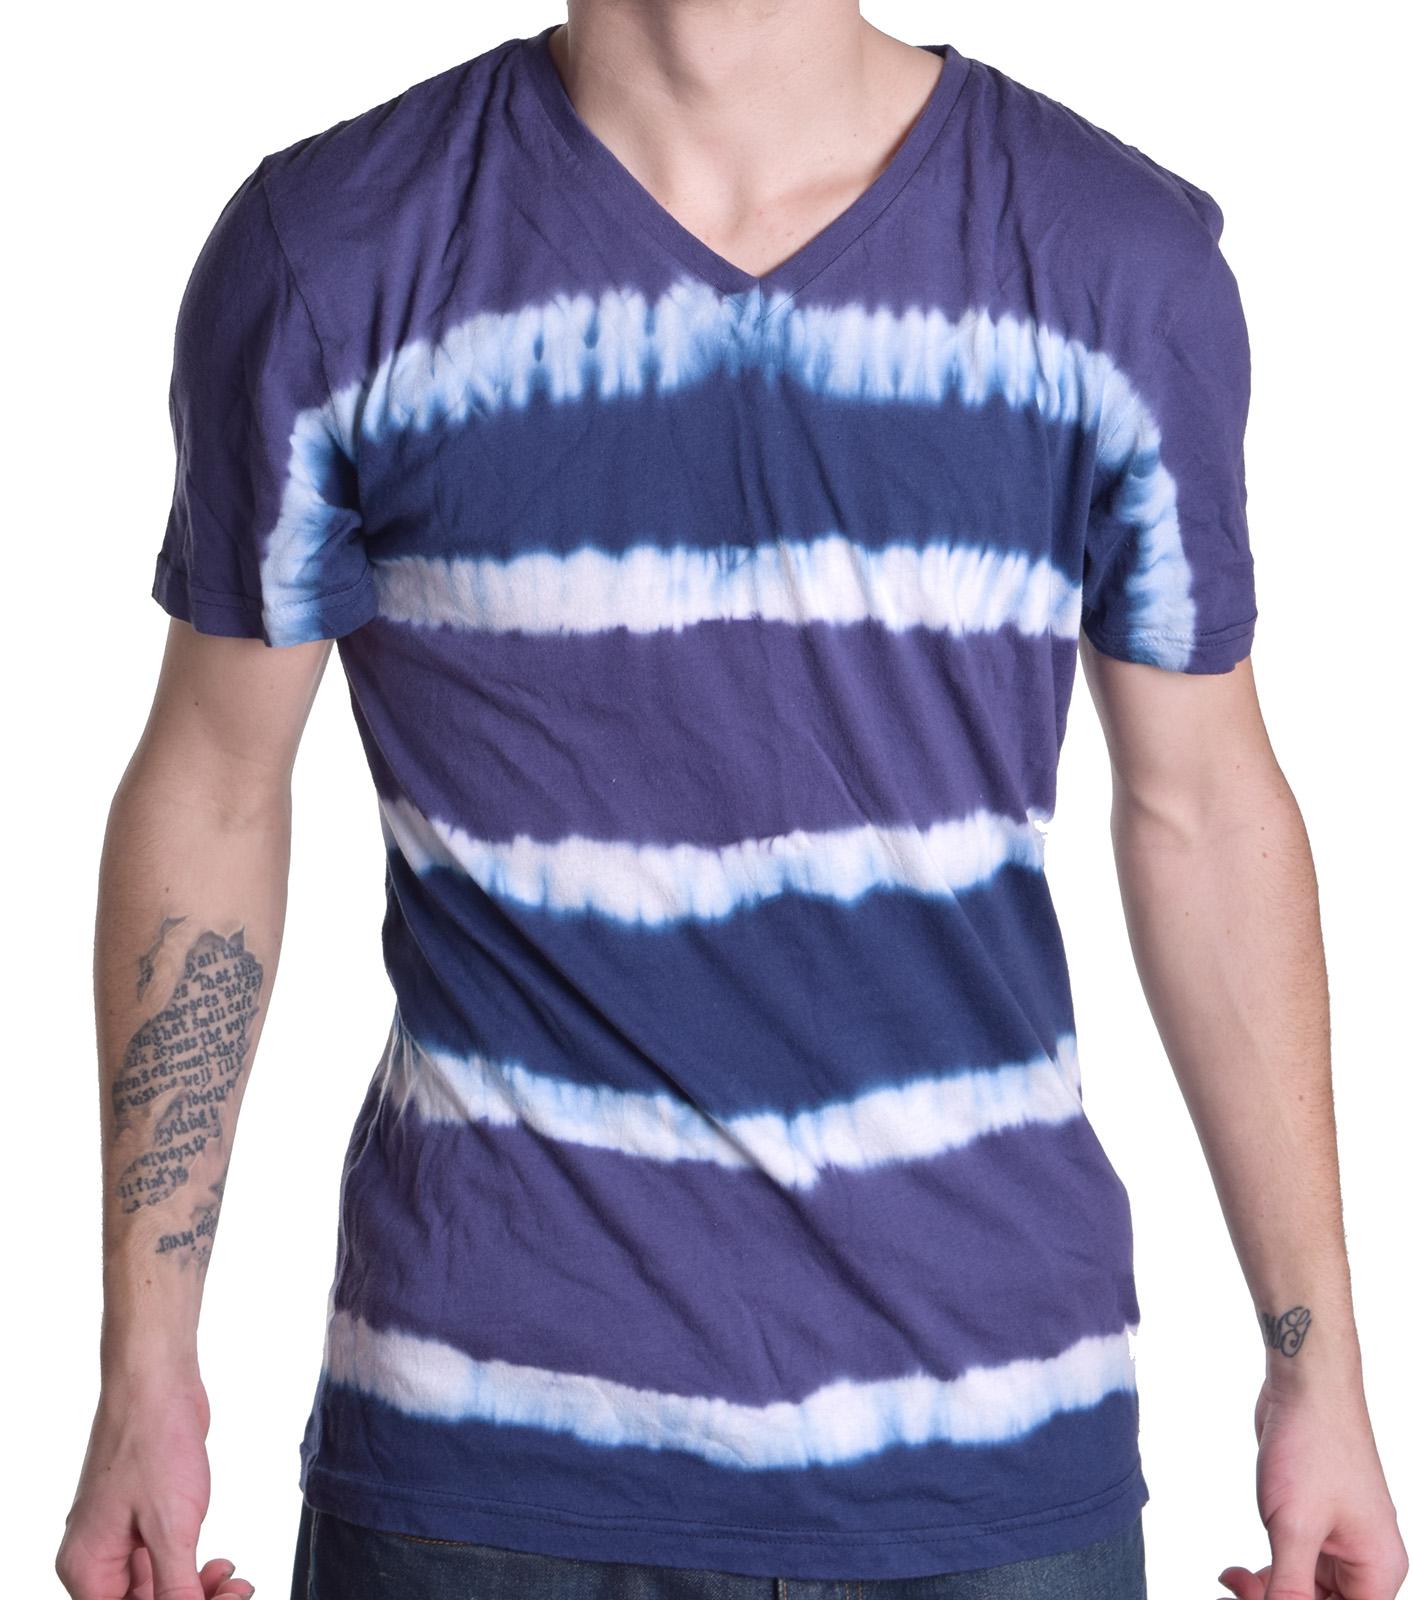 T4t men 39 s sustainable apparel tie dye stripe v neck tee for Tie dye mens t shirts